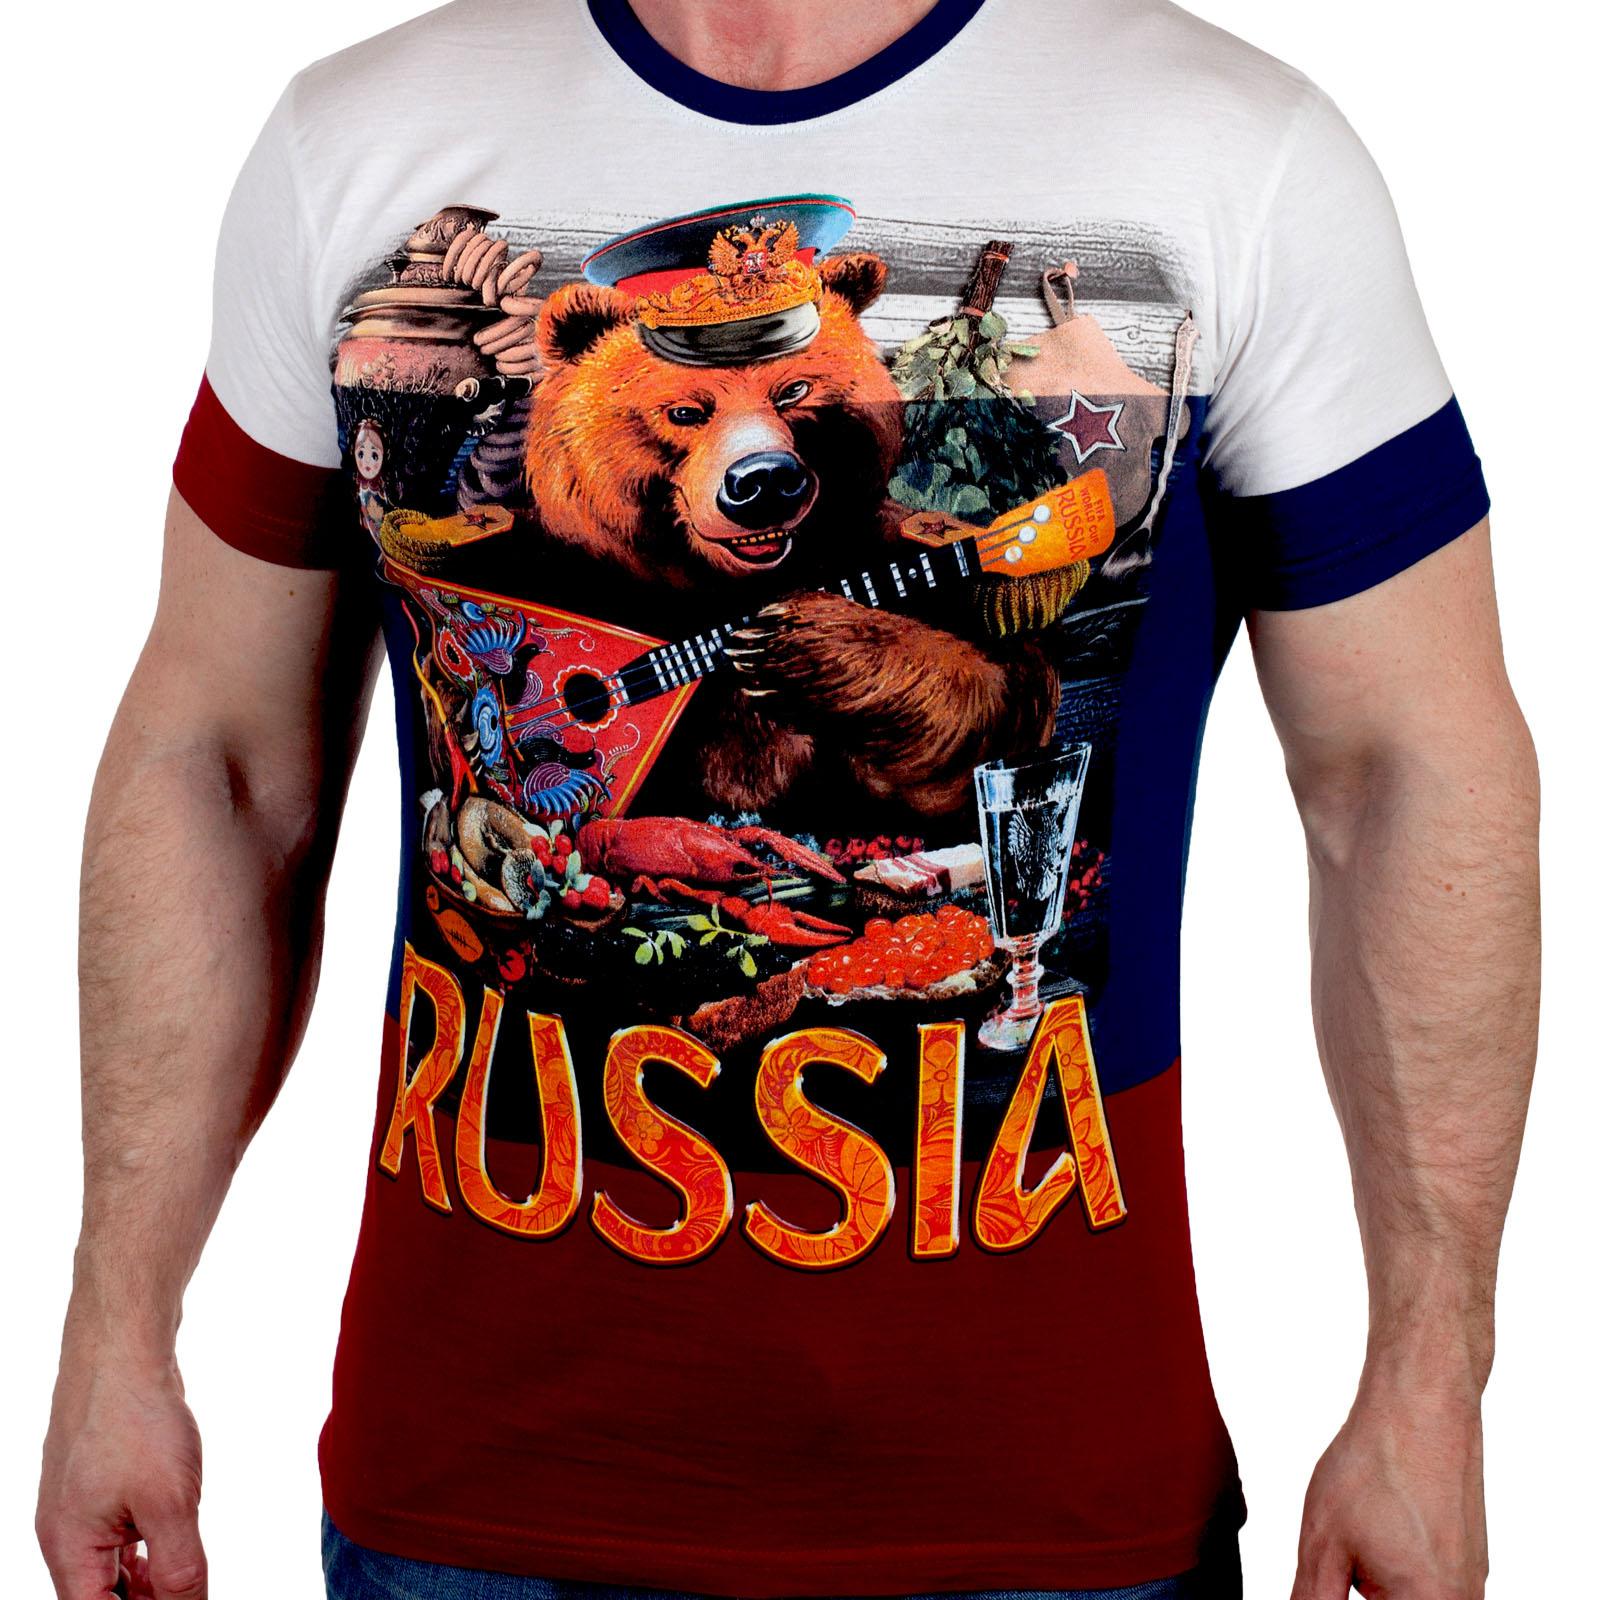 "Трендовая футболка триколор ""Russia""  (Размеры с 44 (XS) по 58 (4XL))"